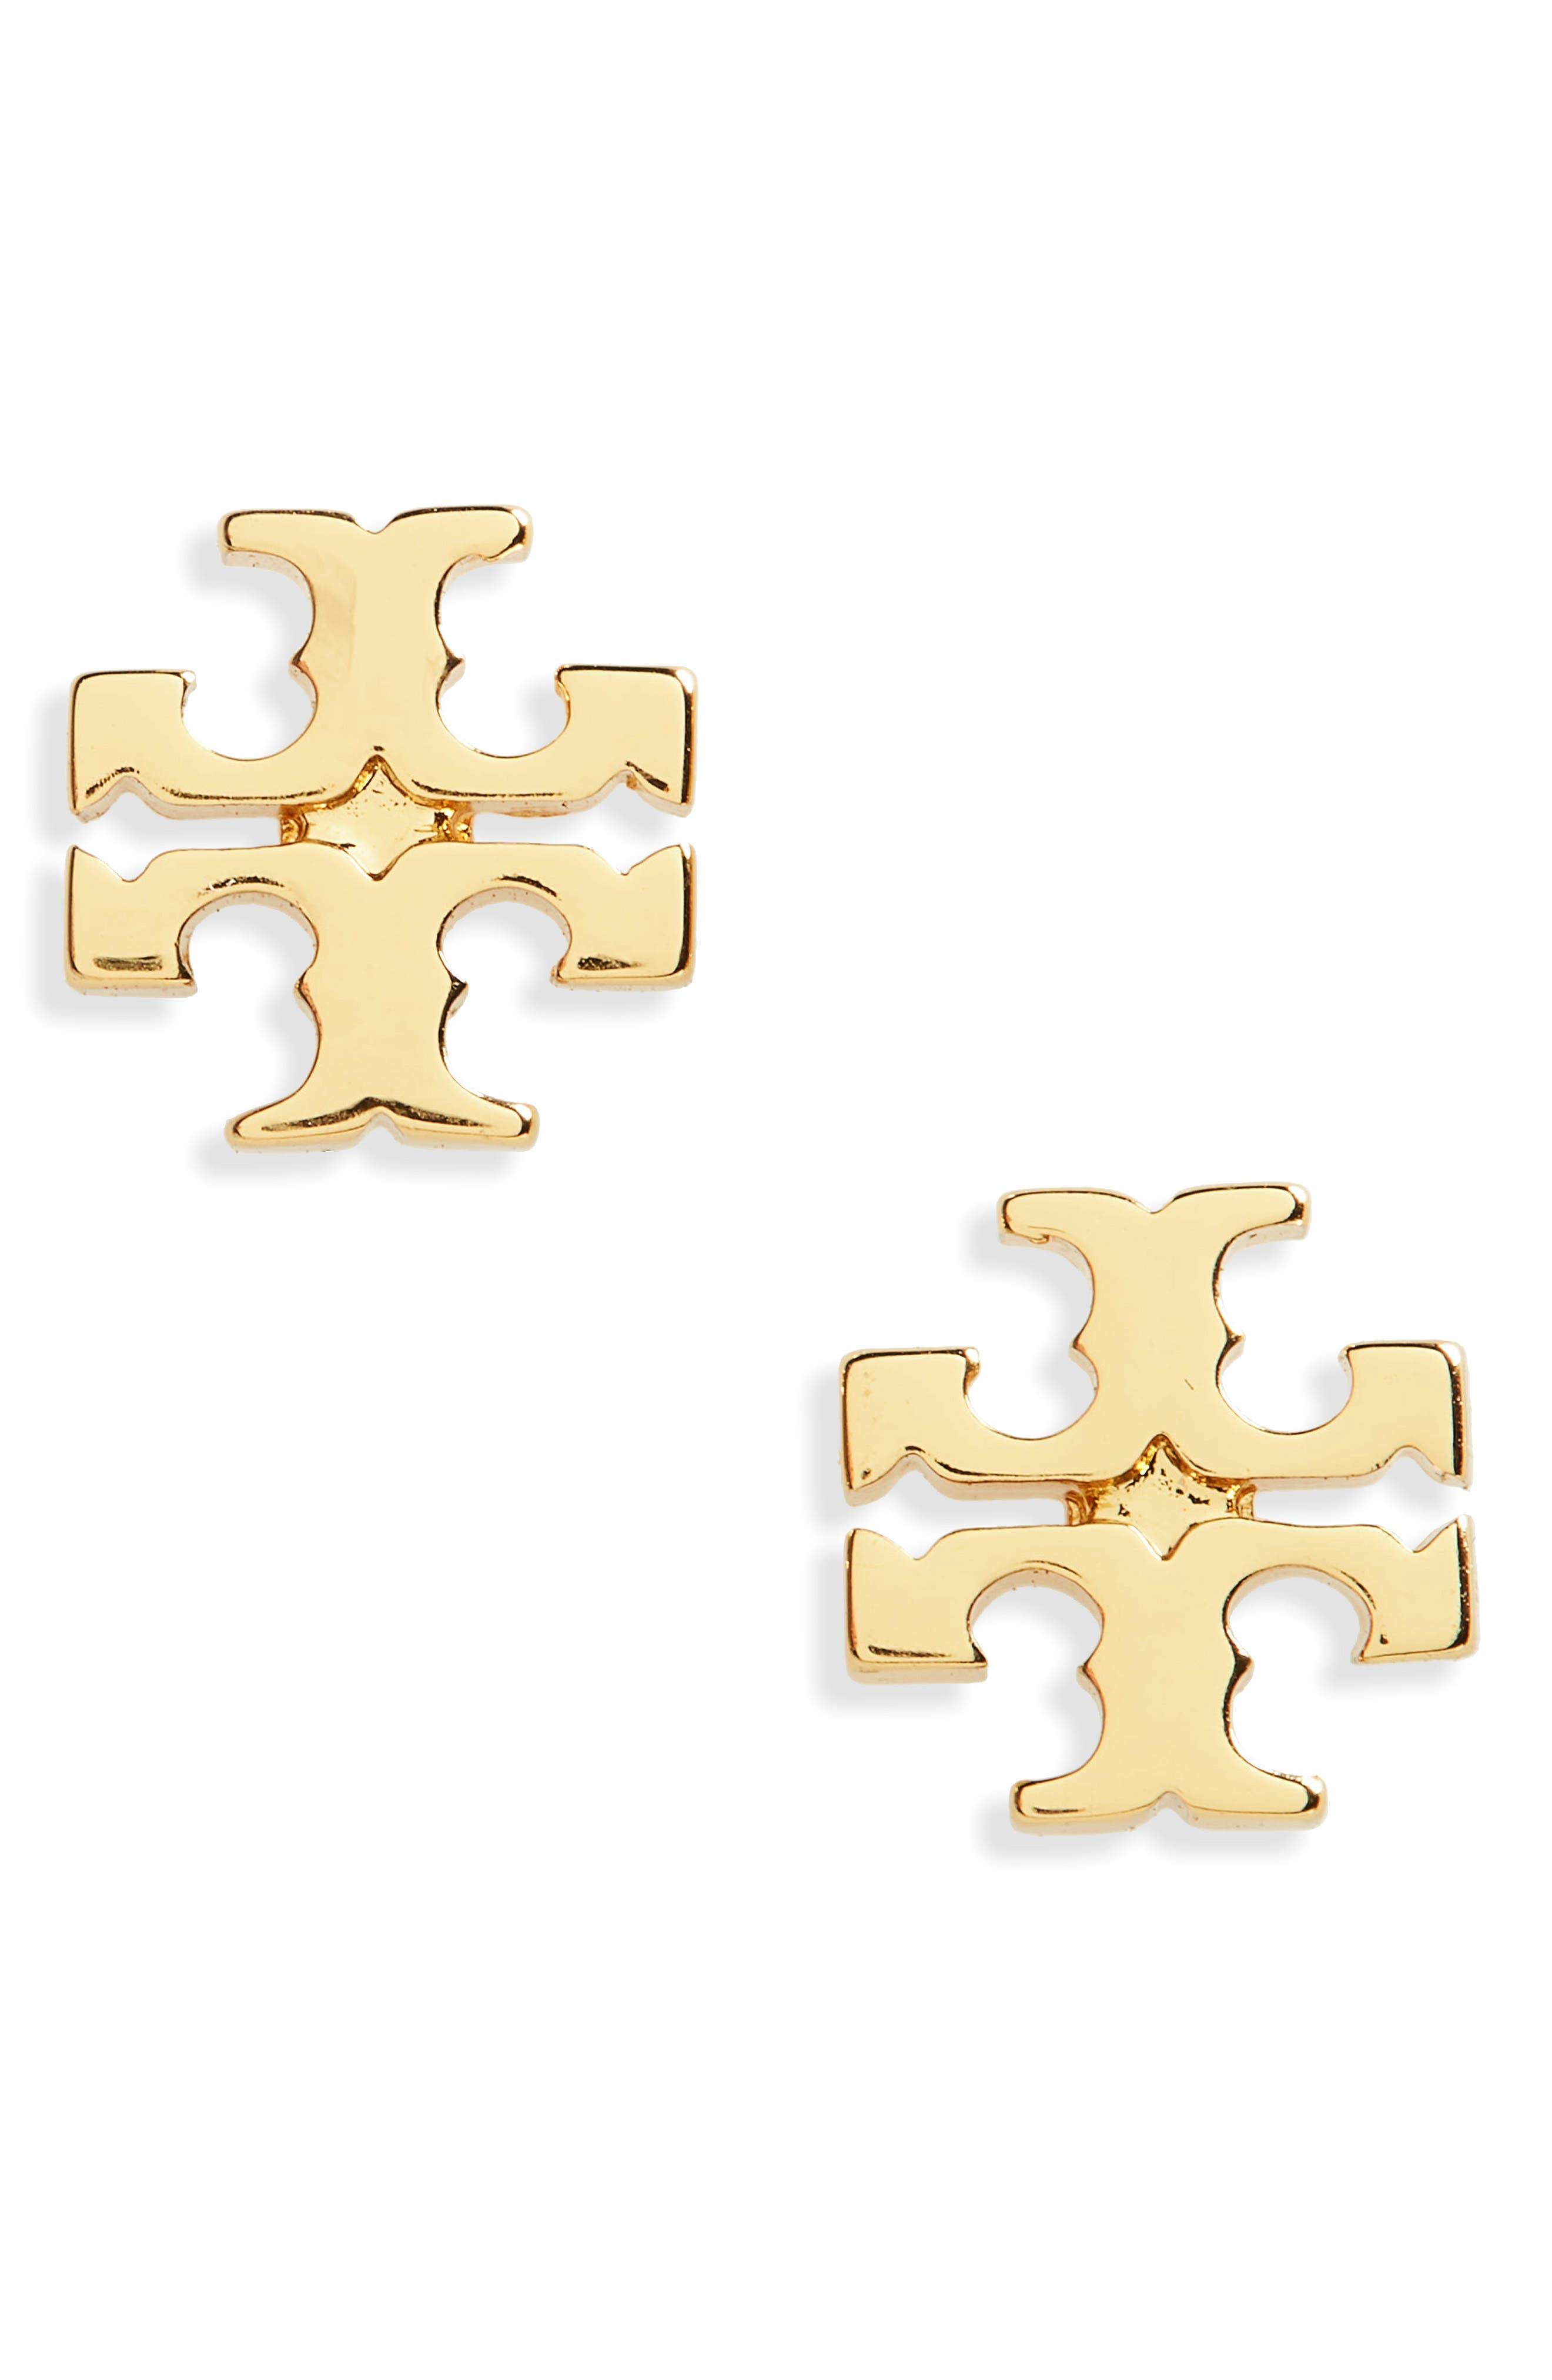 TORY BURCH, Logo Stud Earrings, Main thumbnail 1, color, TORY GOLD